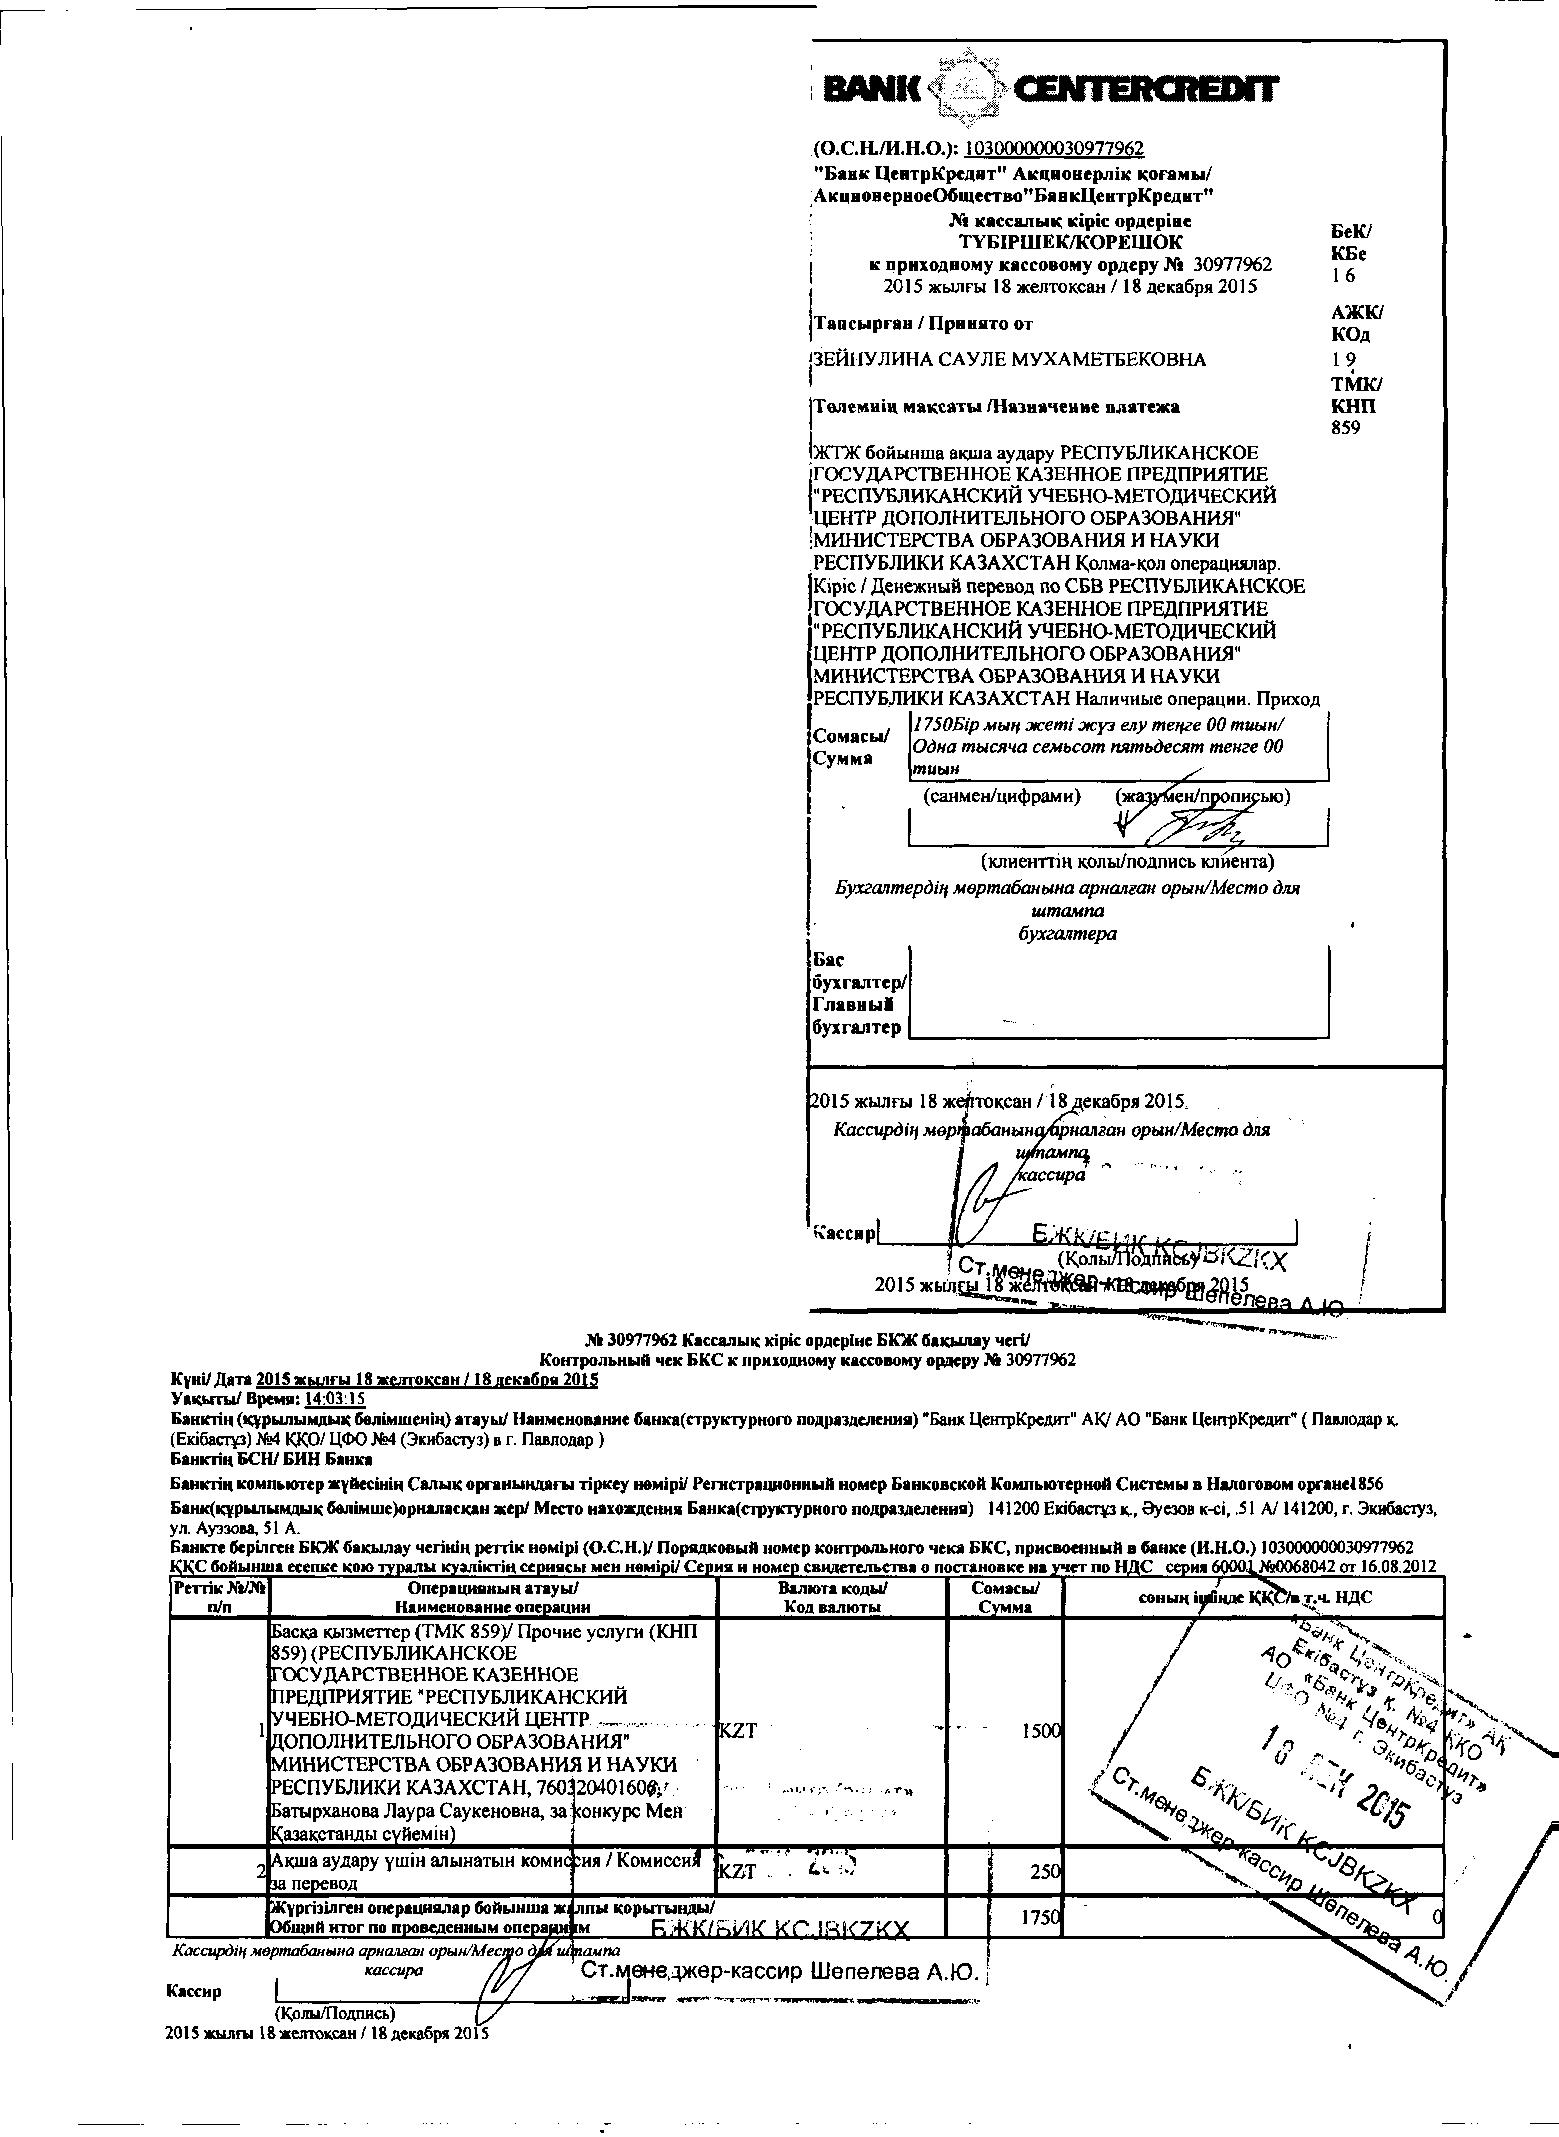 C:\Documents and Settings\server\Рабочий стол\чек конкурс 2.tif